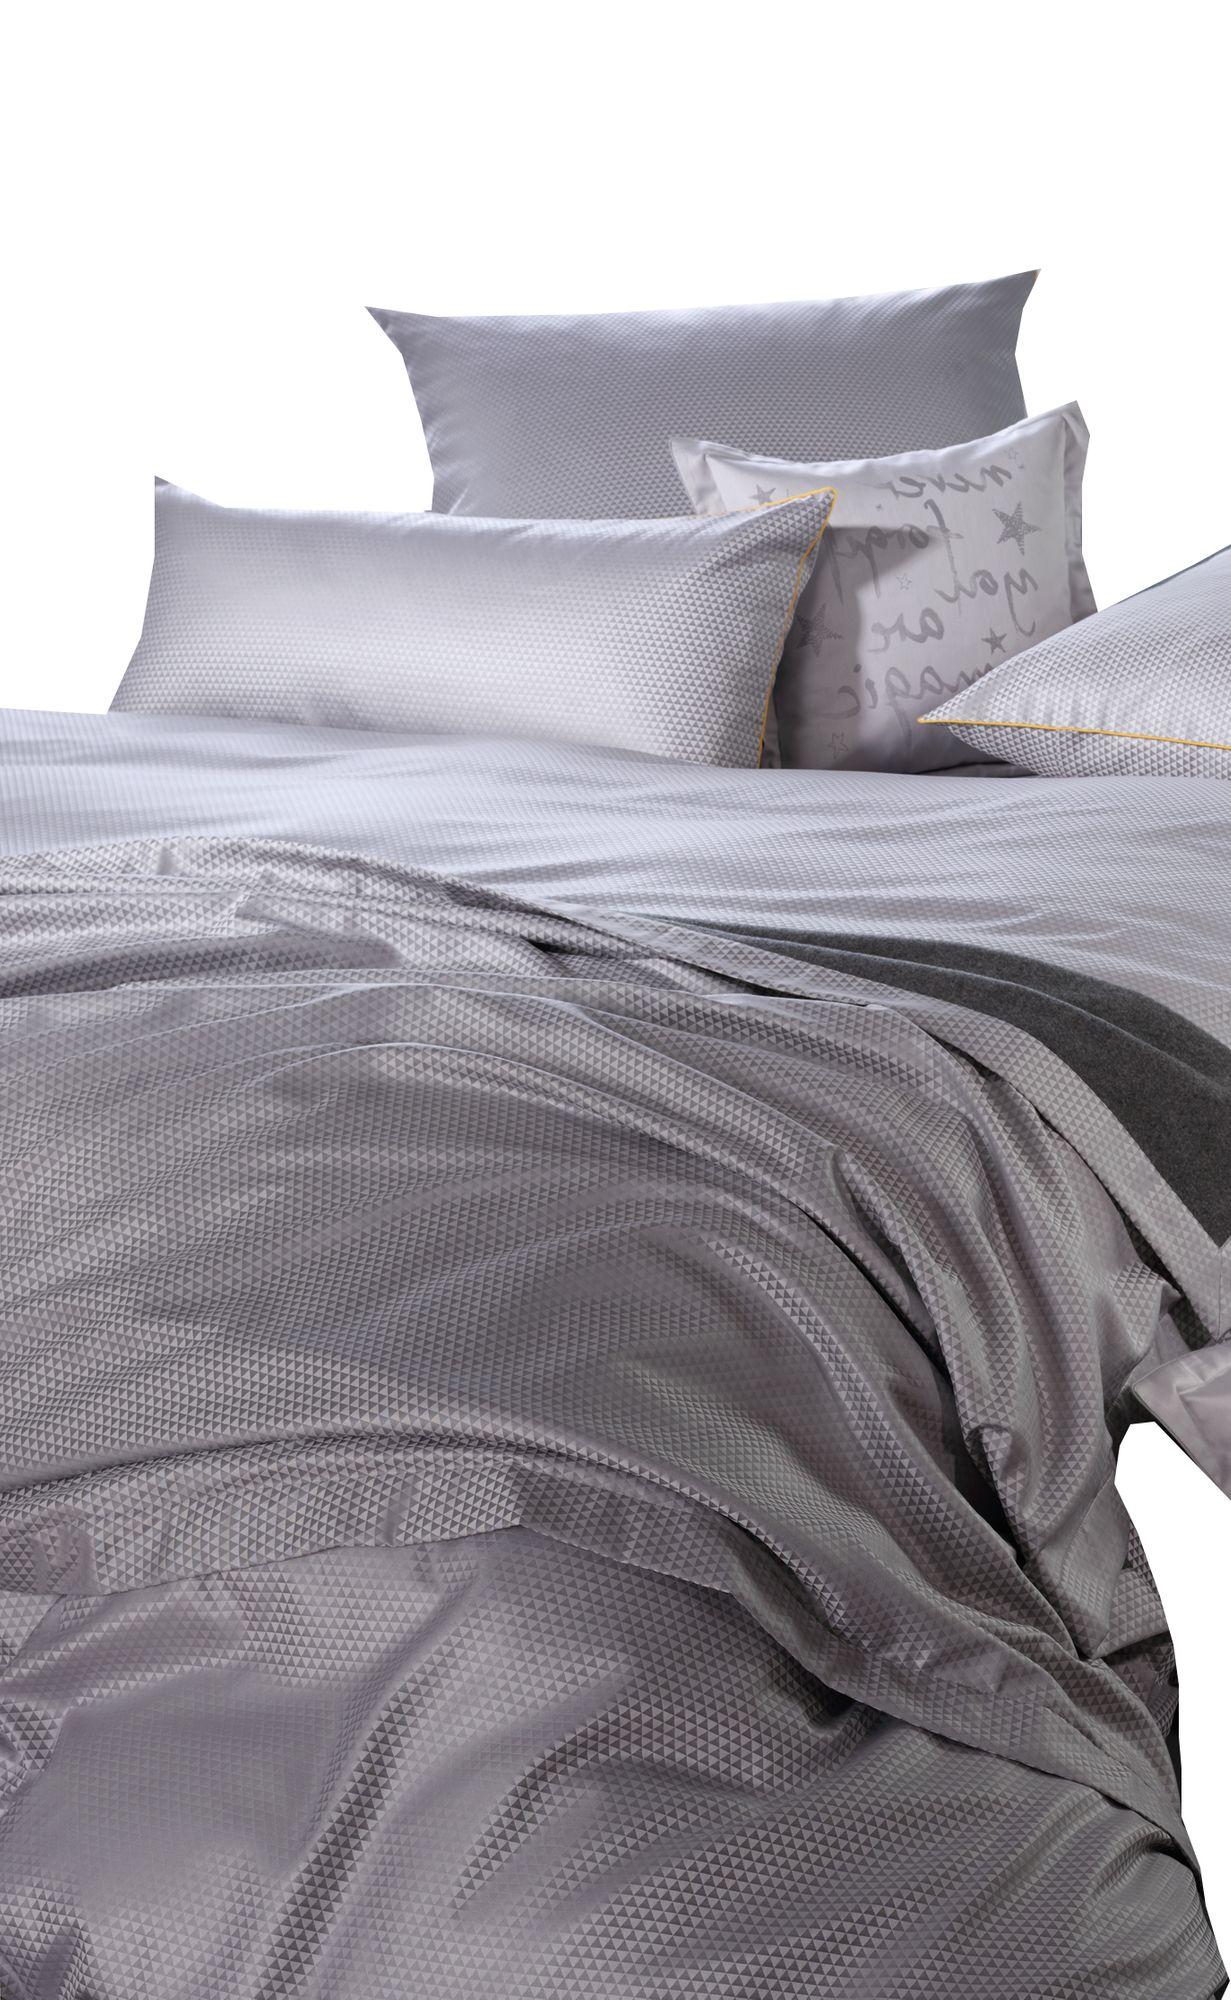 curt bauer mako brokat damast bettw sche maris gr e 155x220 80x80 cm farbe perlgrau bettw sche. Black Bedroom Furniture Sets. Home Design Ideas